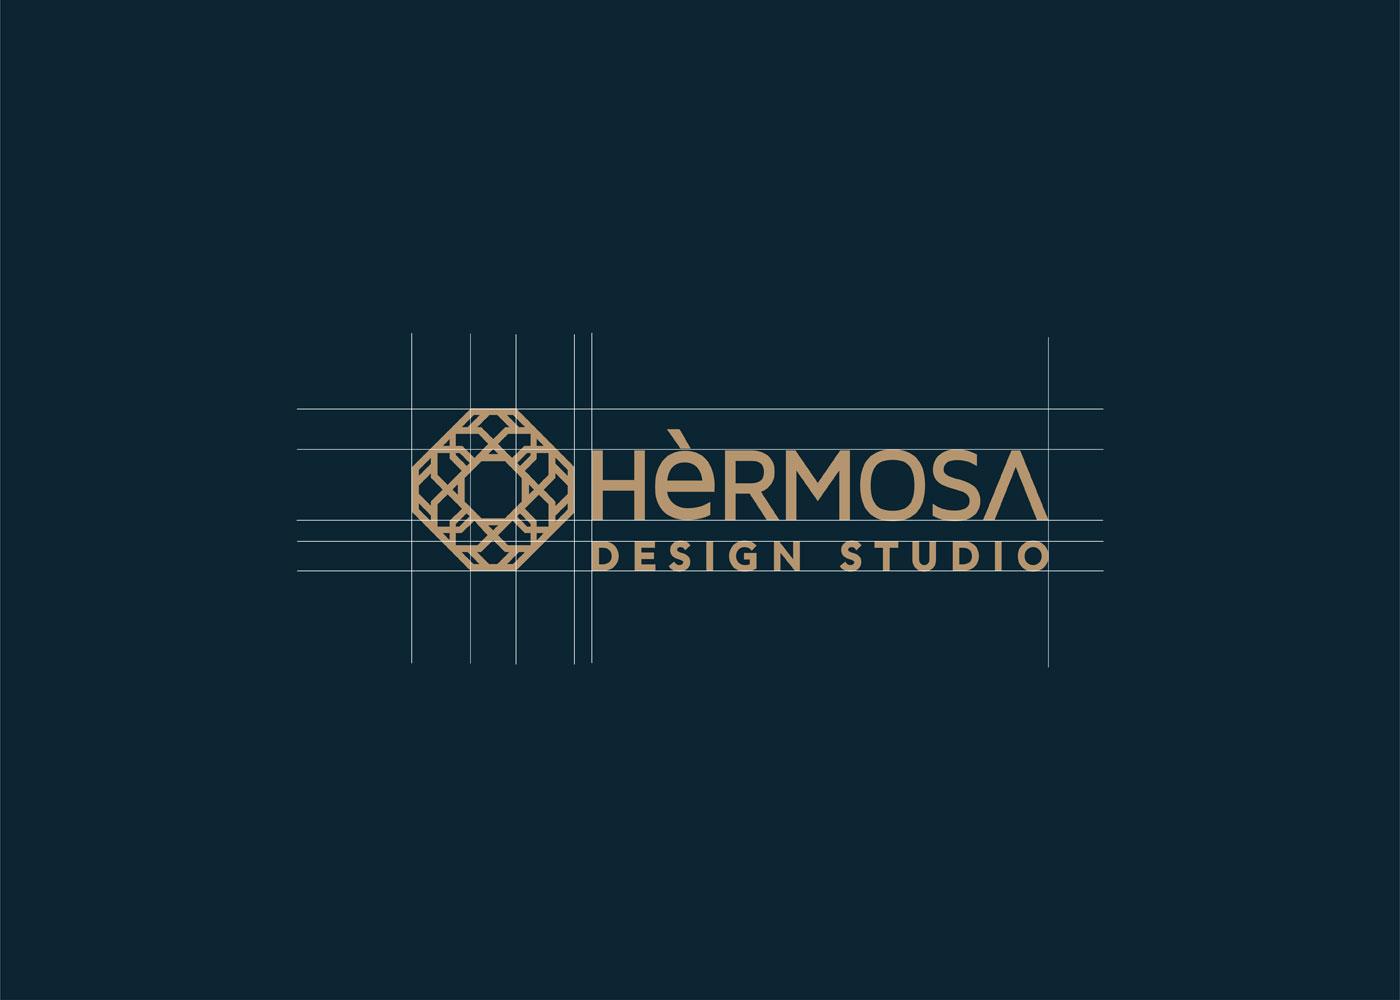 Hermosa-New-022